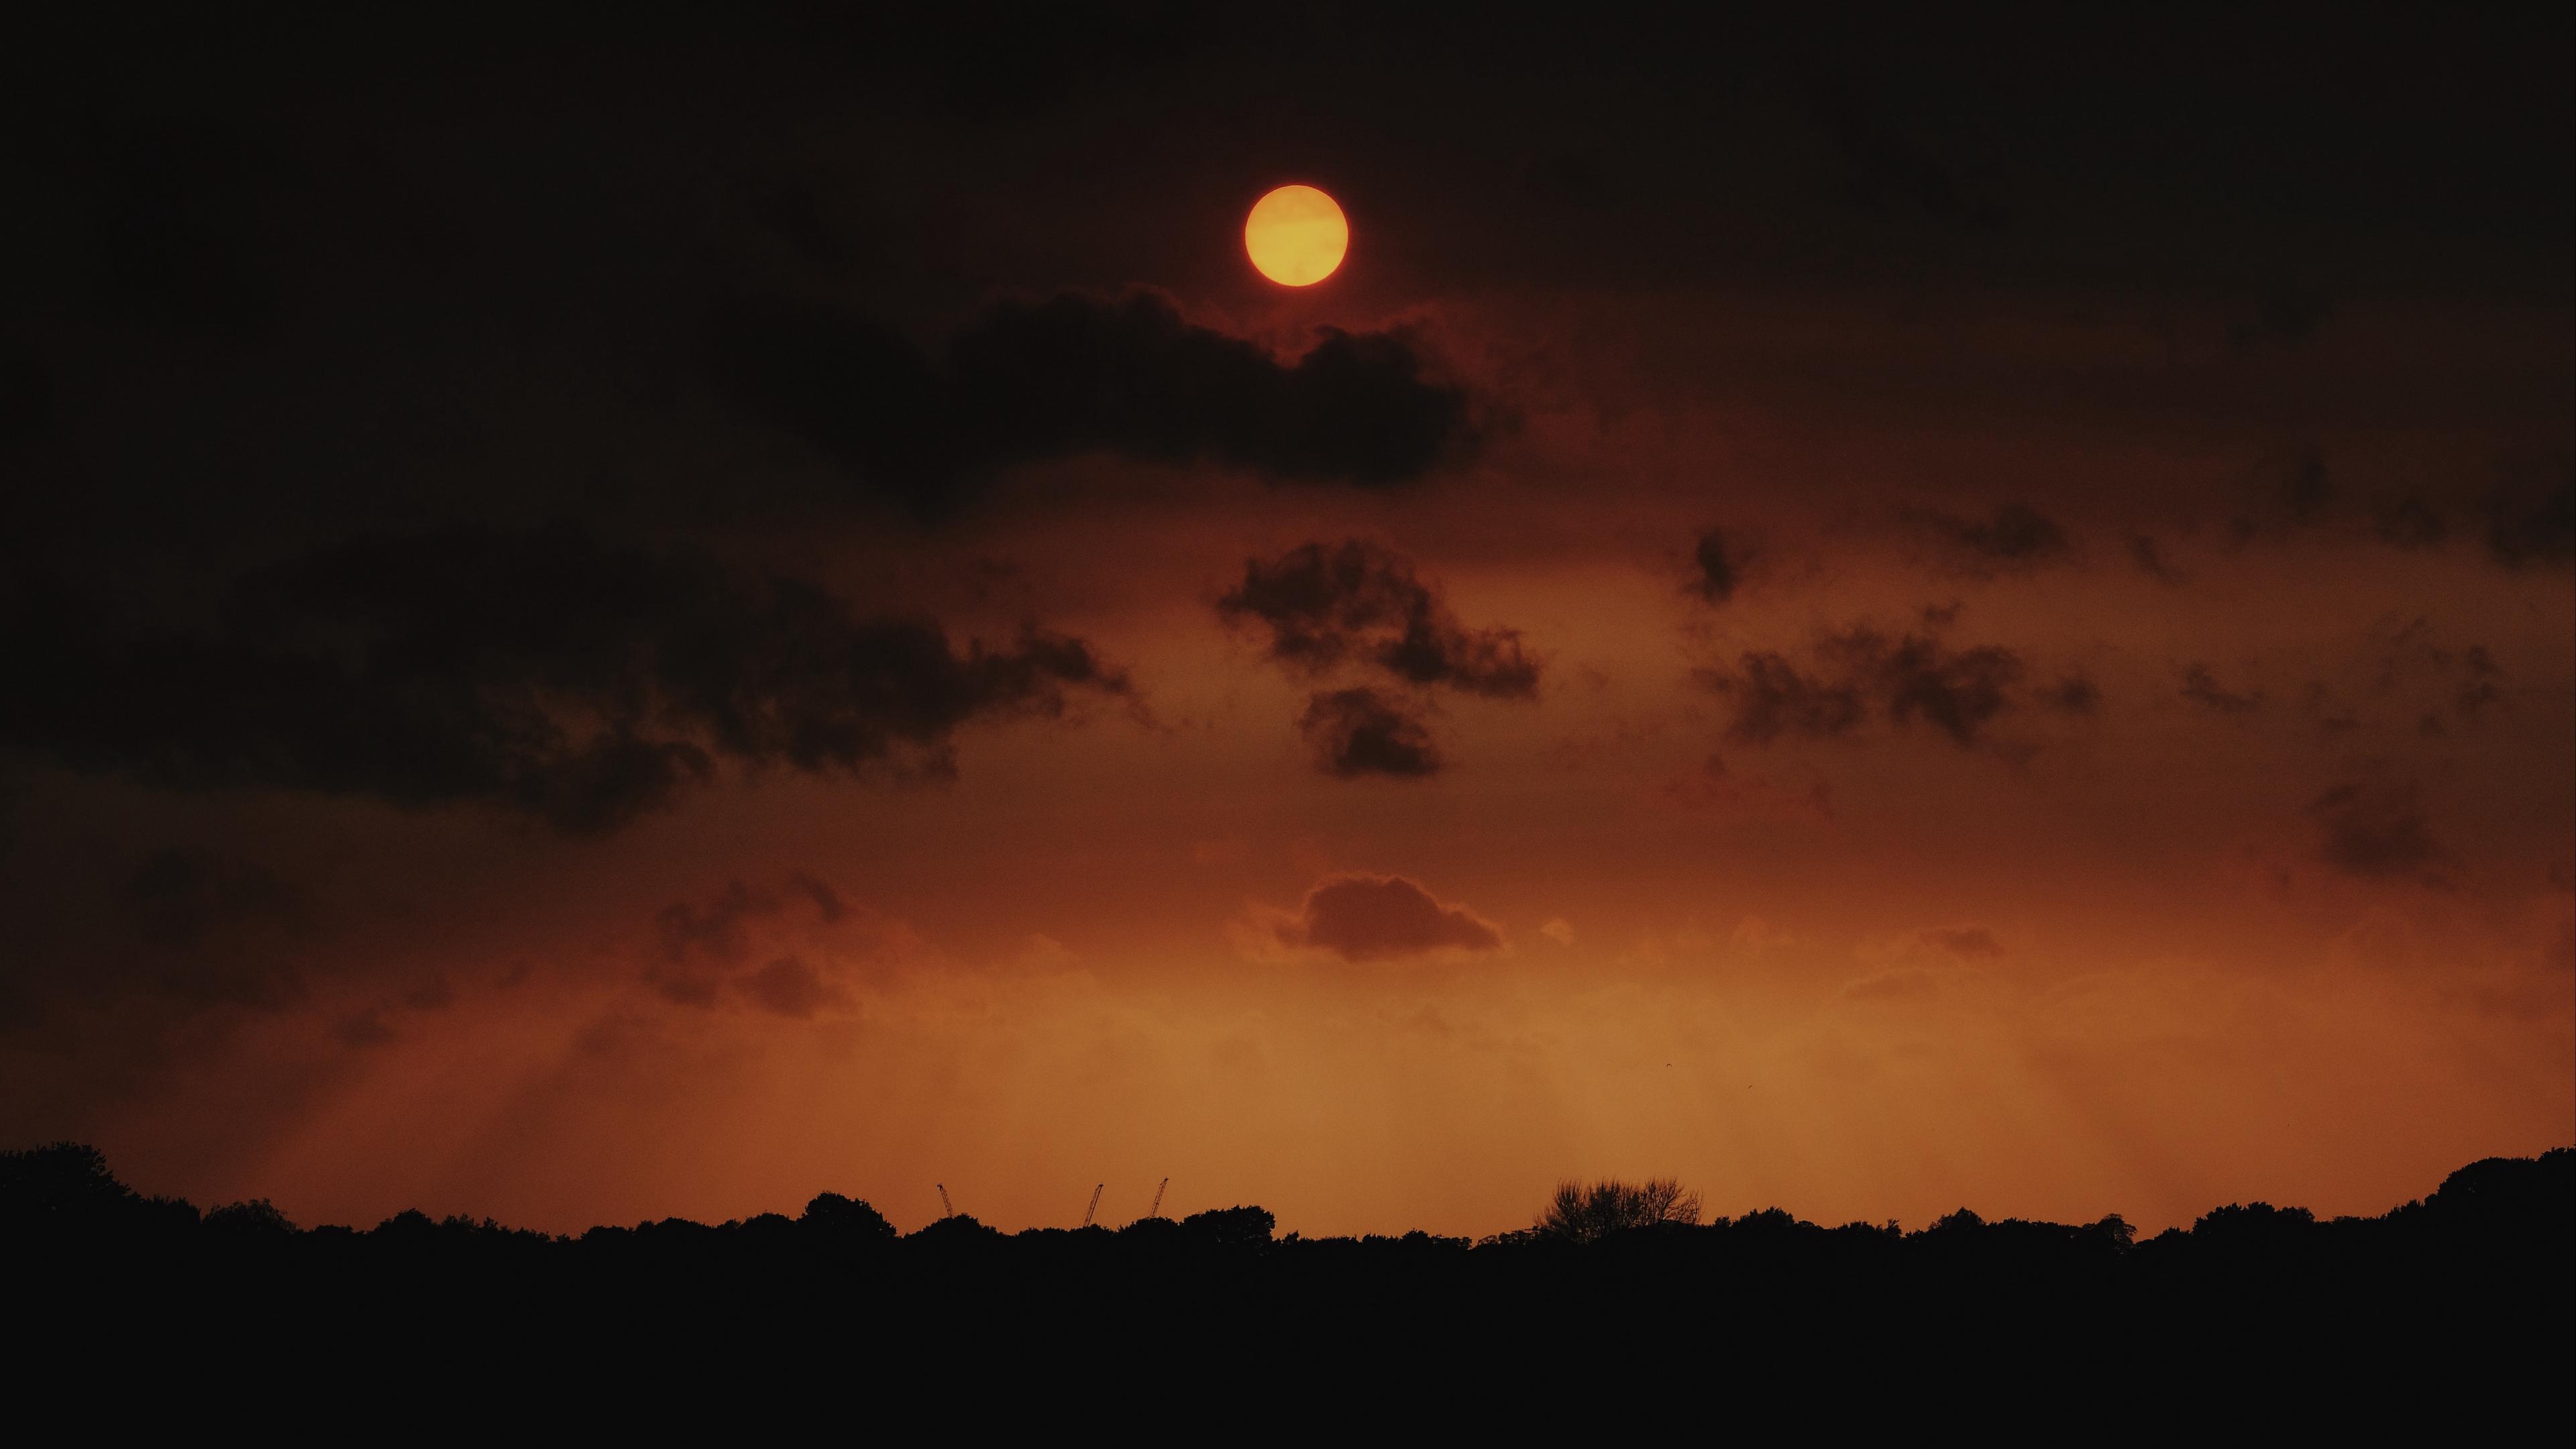 moon night sky clouds 4k 1540575295 - moon, night, sky, clouds 4k - Sky, Night, Moon